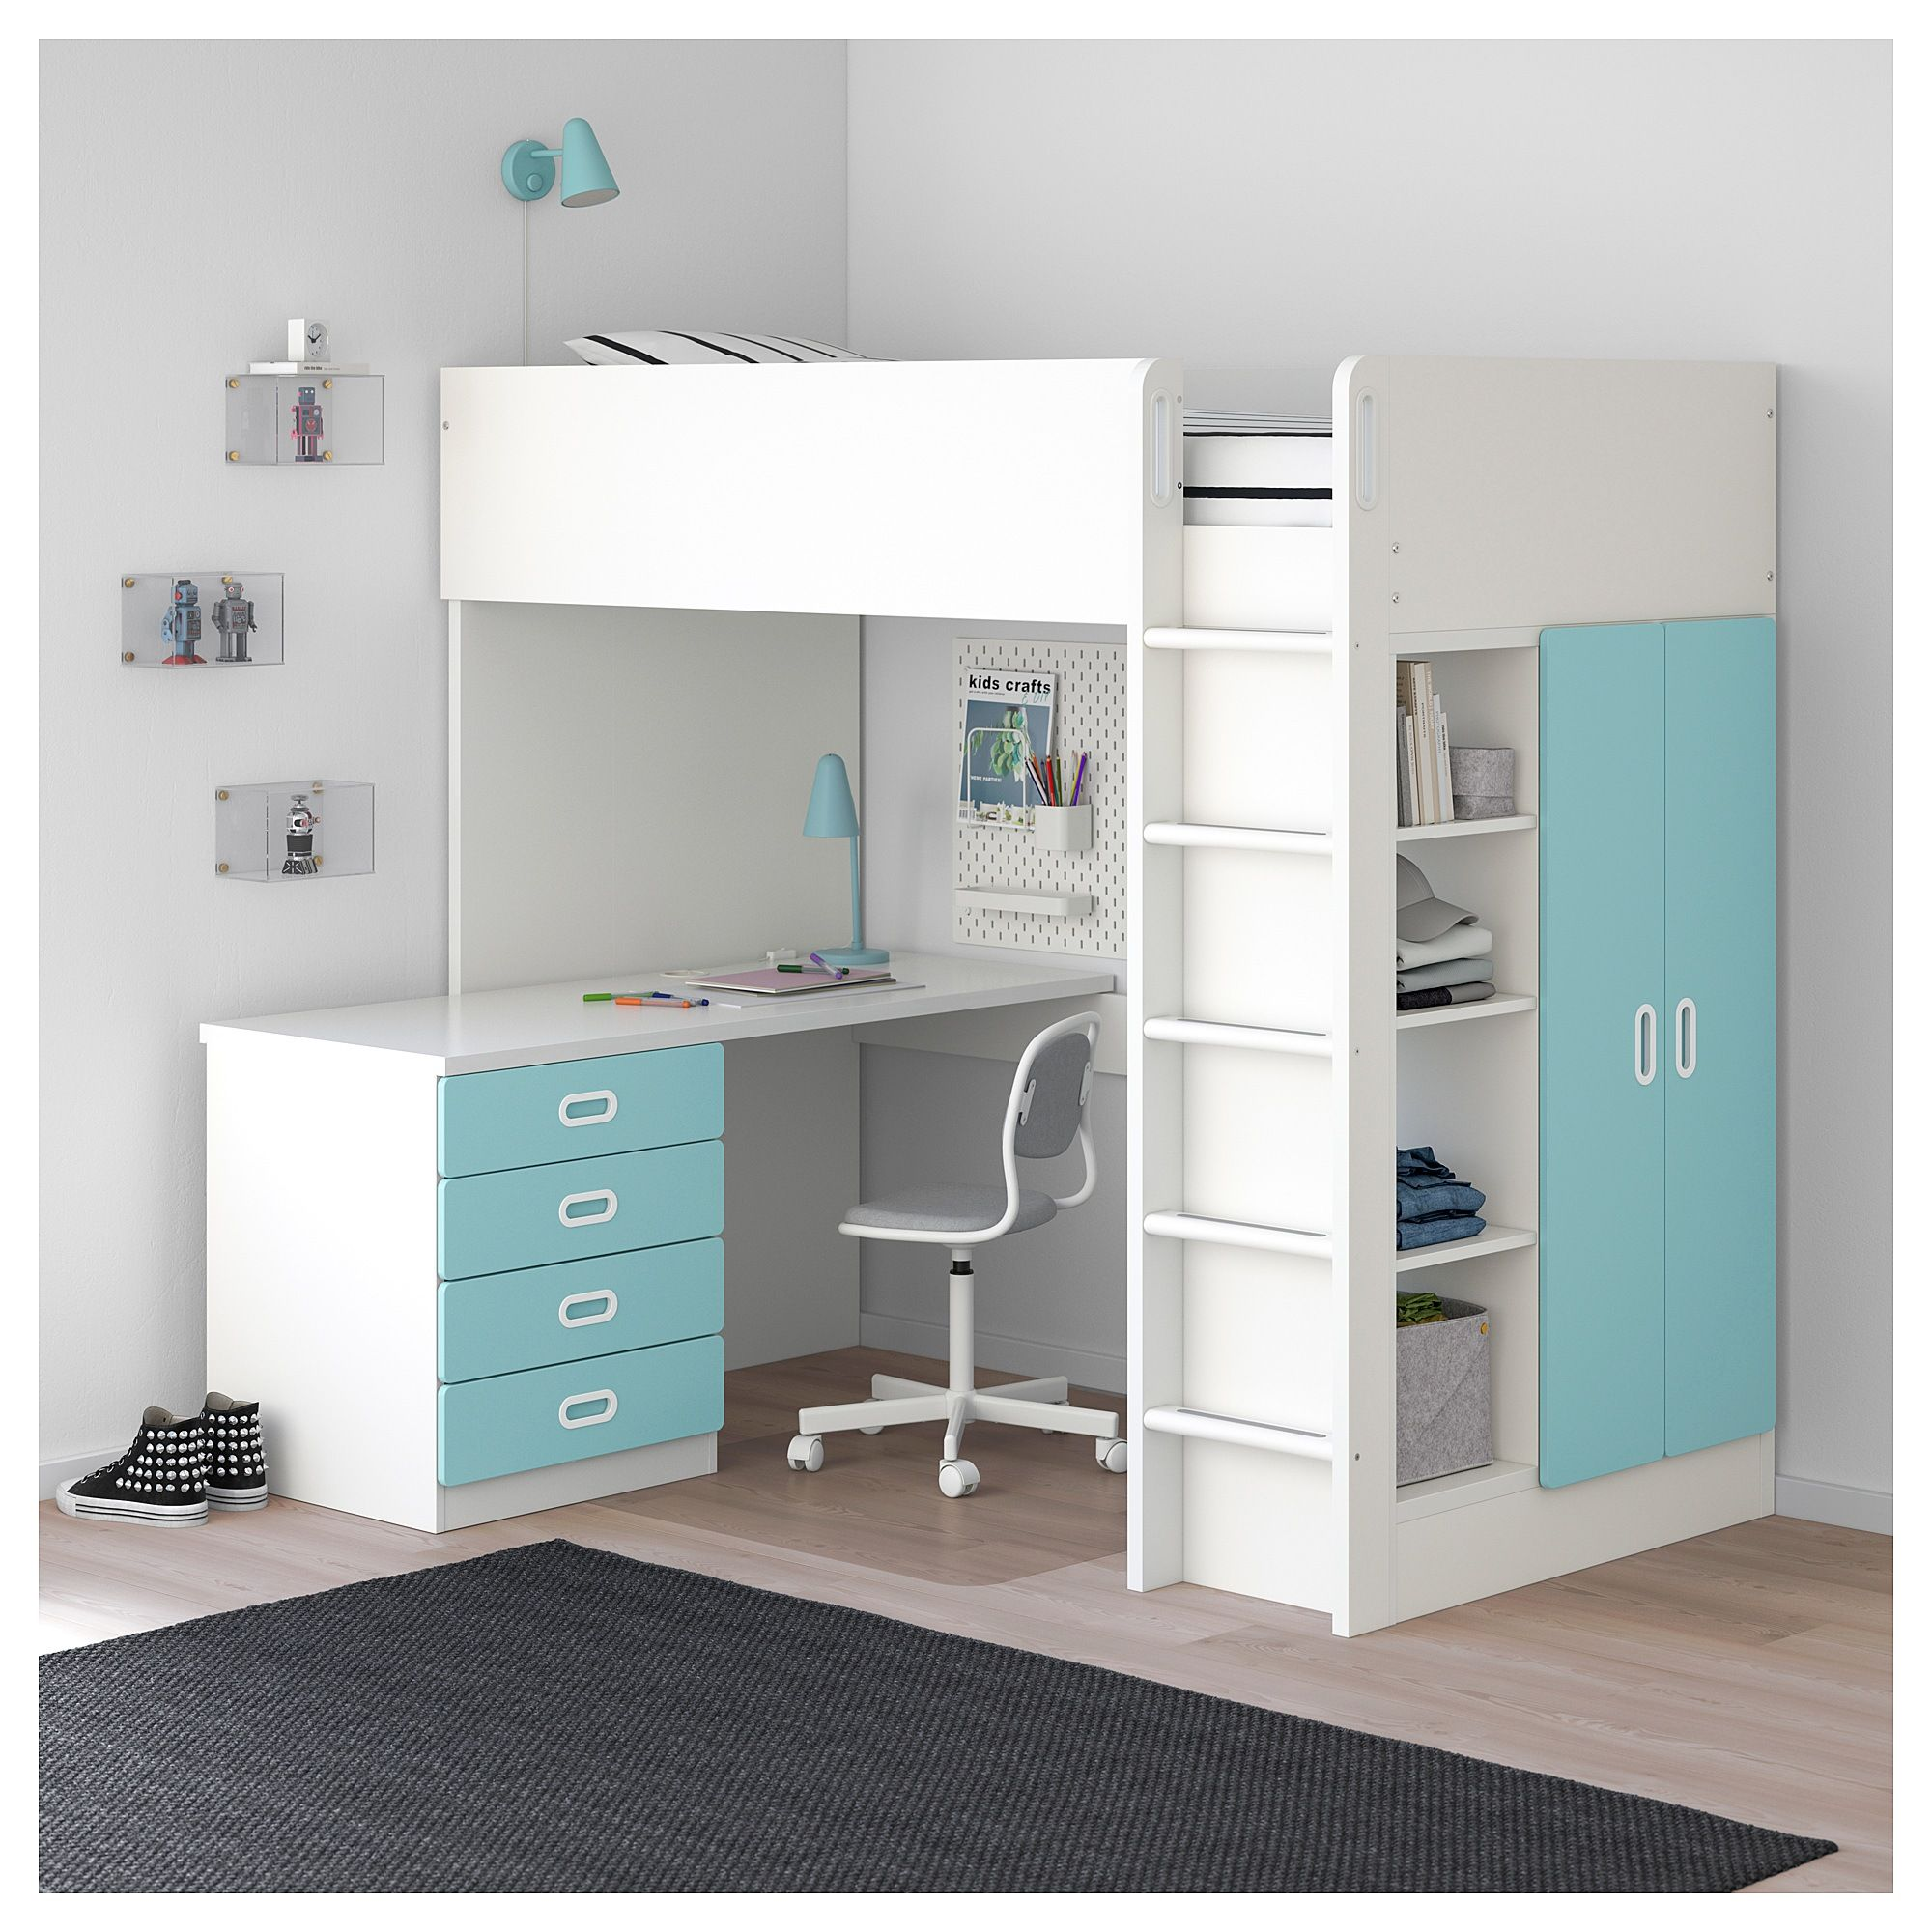 Stuva Fritids Loft Bed With 4 Drawers 2 Doors White Light Blue Ikea Loft Bed Frame Girls Loft Bed Loft Beds For Teens